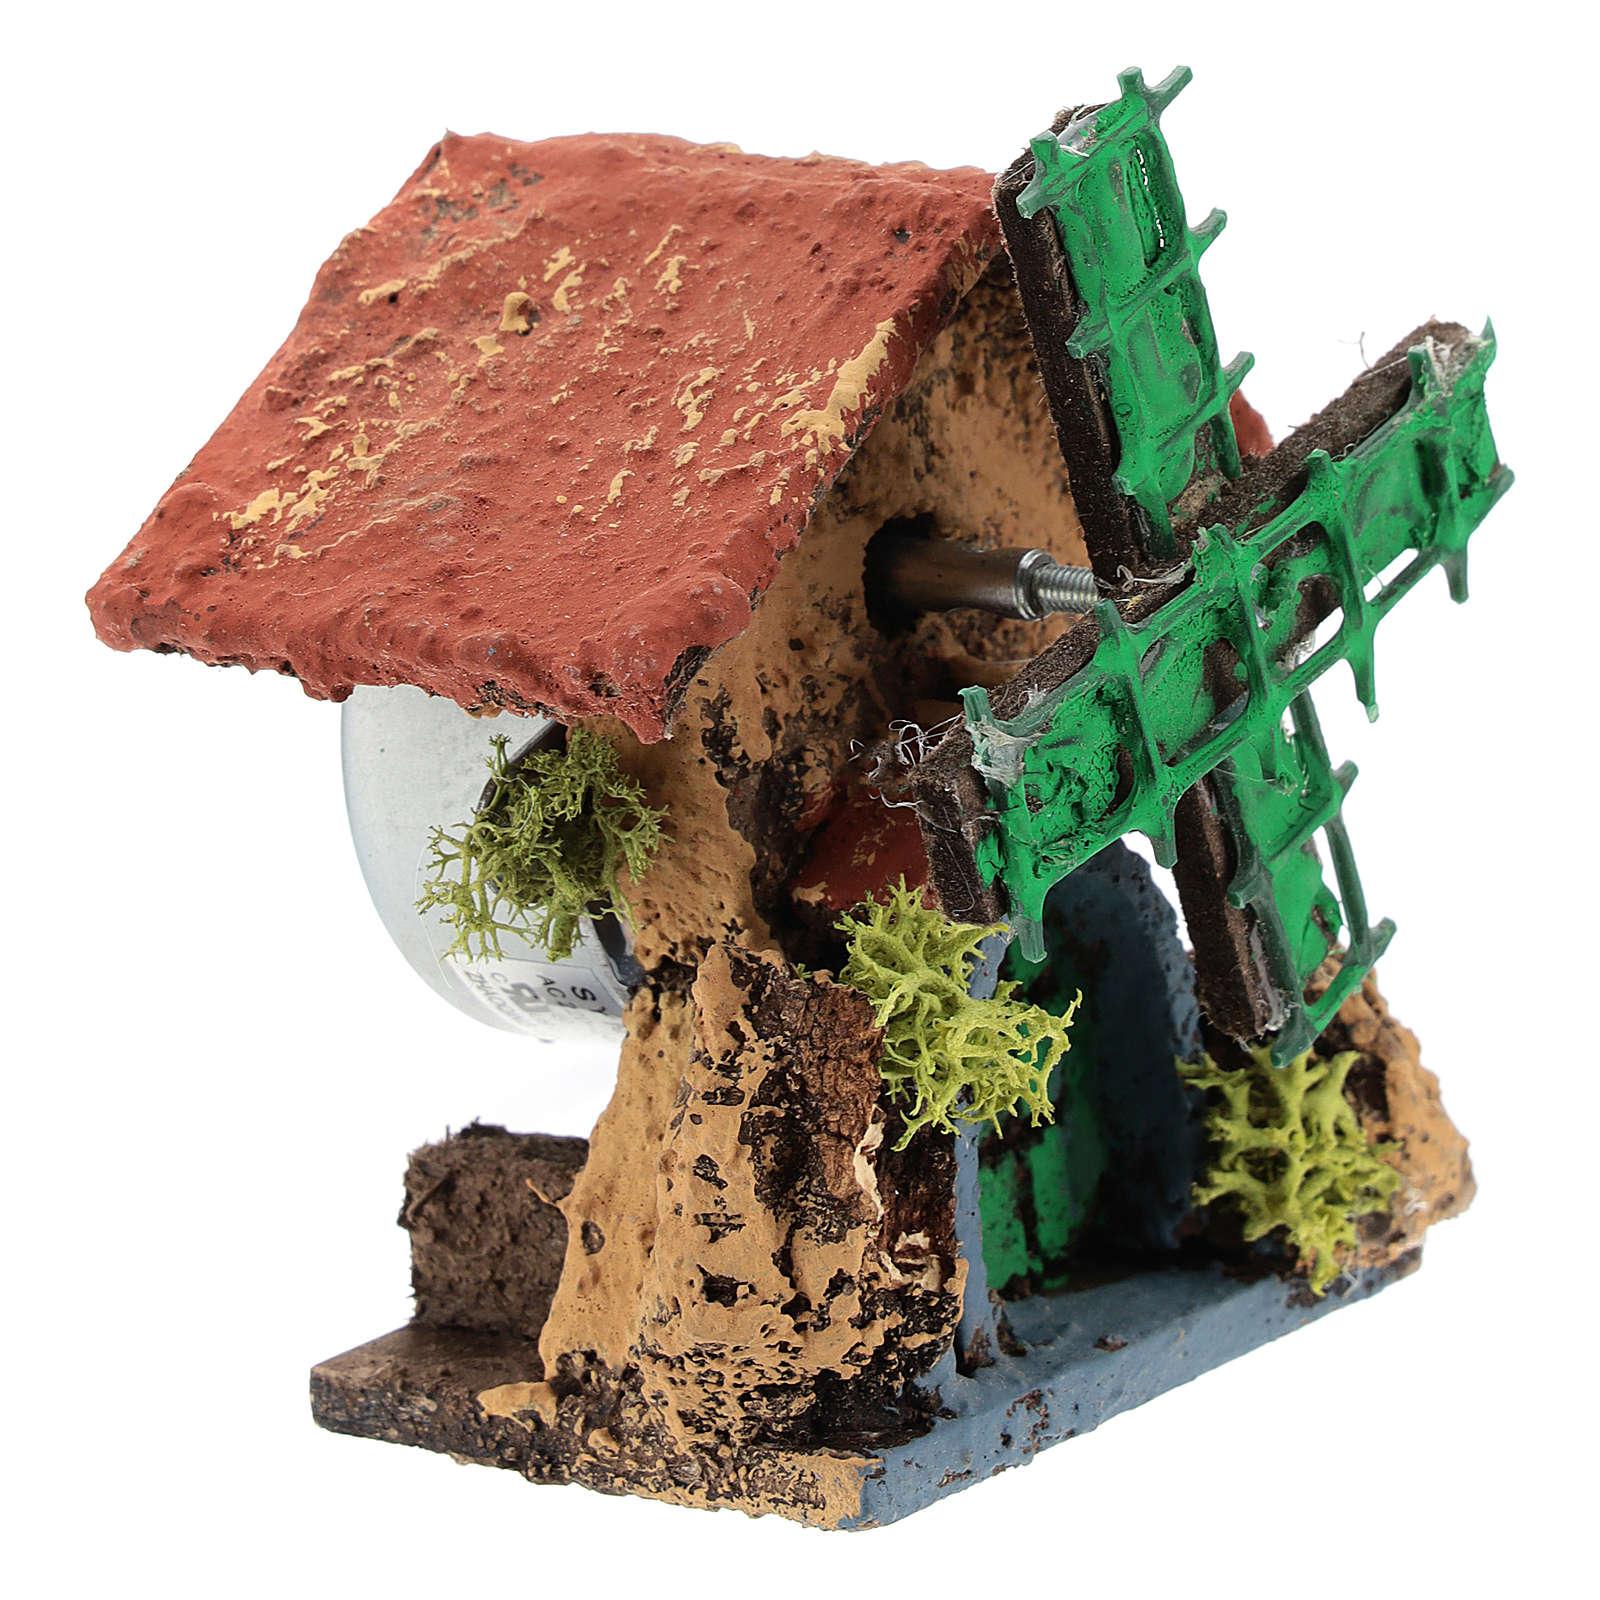 Cabaña con molino de viento 10x5x5 cm belén napolitano 4-6 cm 4